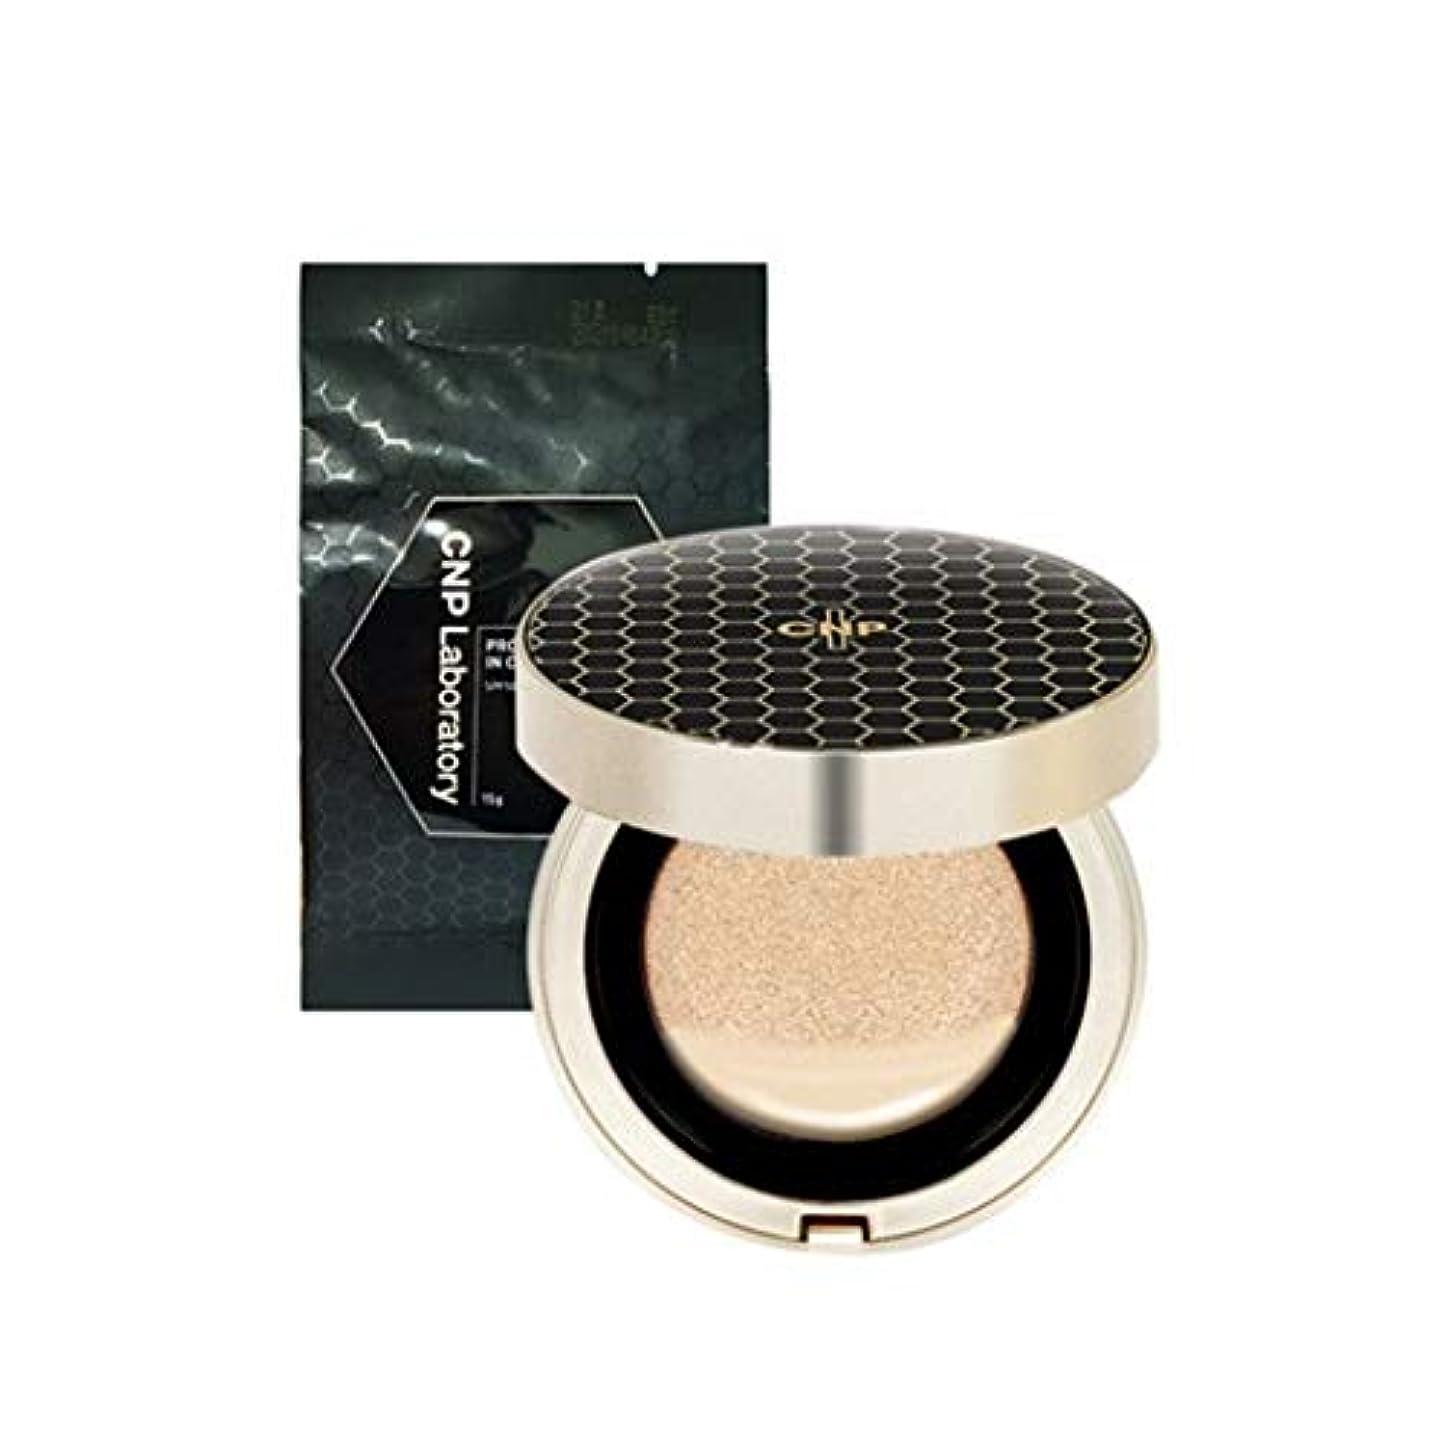 [CNP] Propolis Ampule In Cushion (#21) 15g +refill15g /[CNP]プロポリスアンプルインクッション(#21号)15g +リフィル15g [並行輸入品]